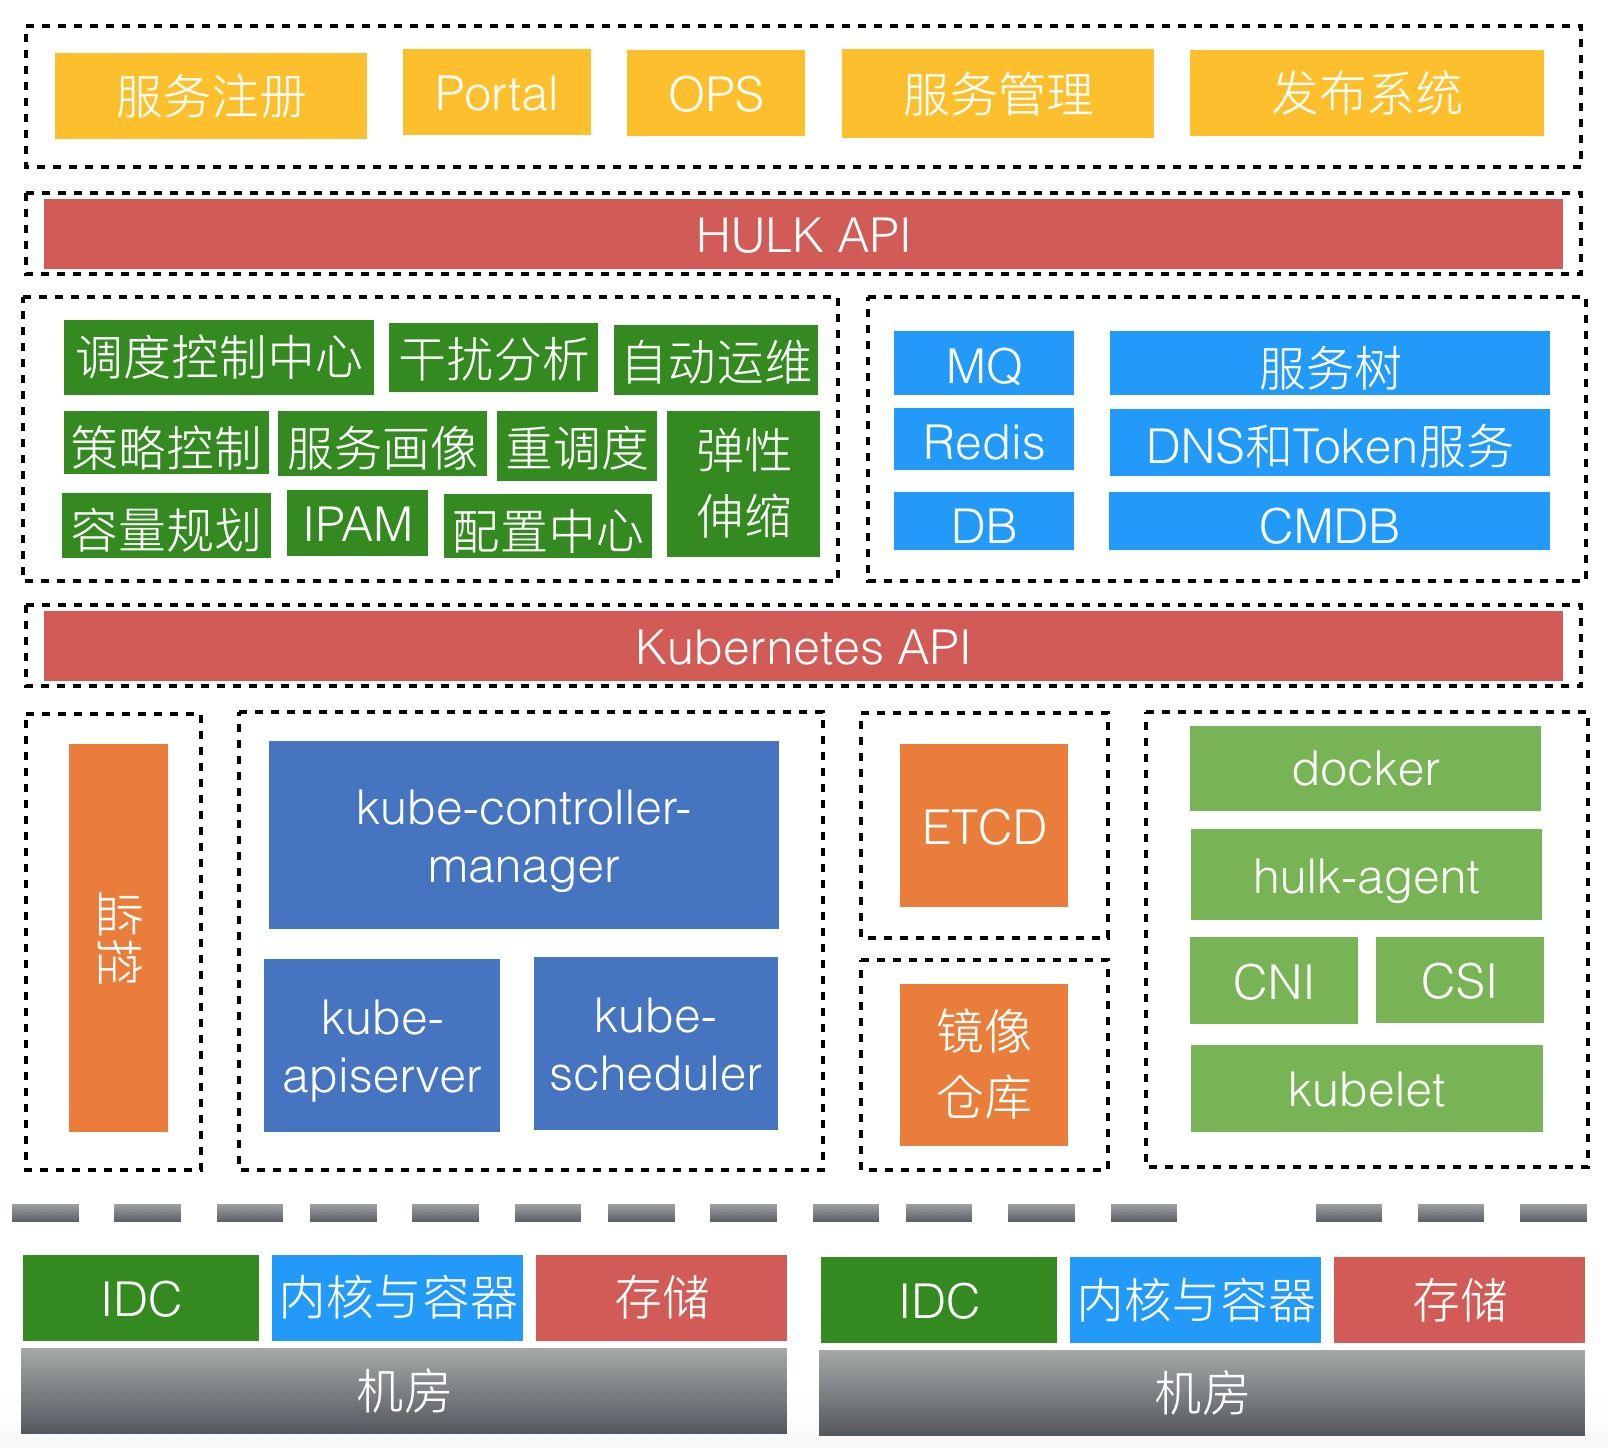 HULK2.0架构图